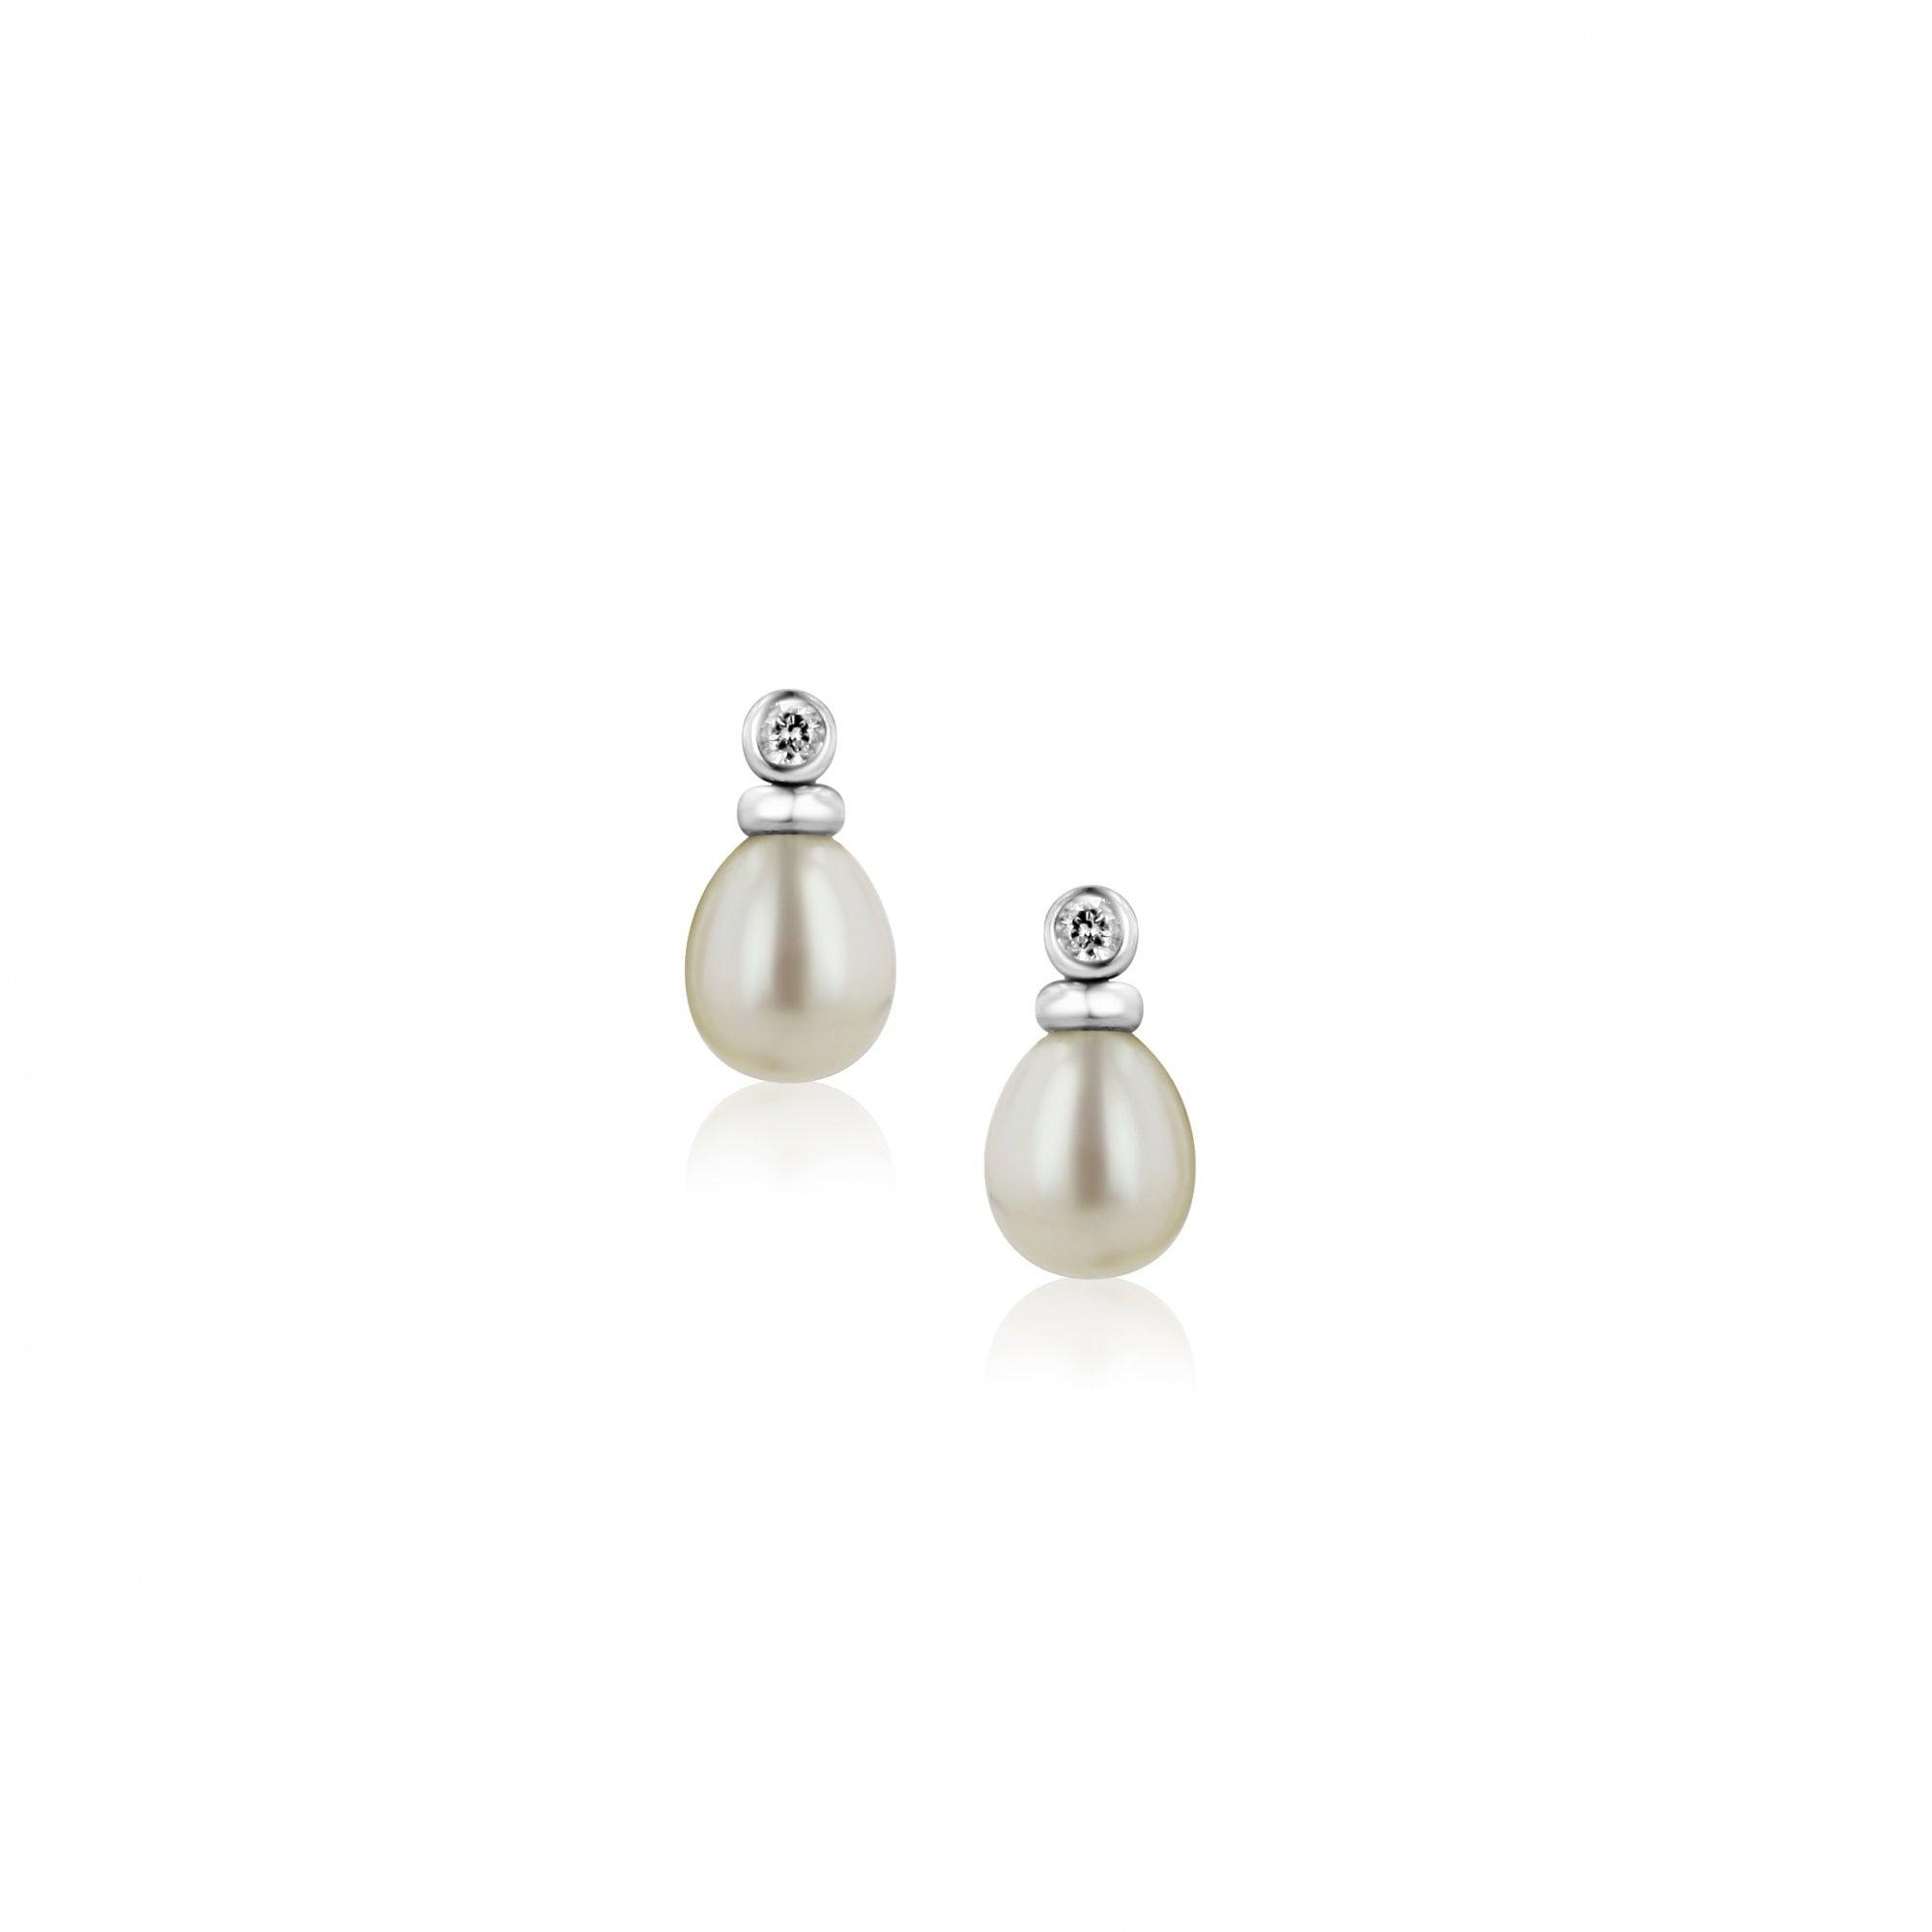 49c4dc490 9ct White Gold Pearl and Diamond Stud Earrings - Womens from Avanti of  Ashbourne Ltd UK